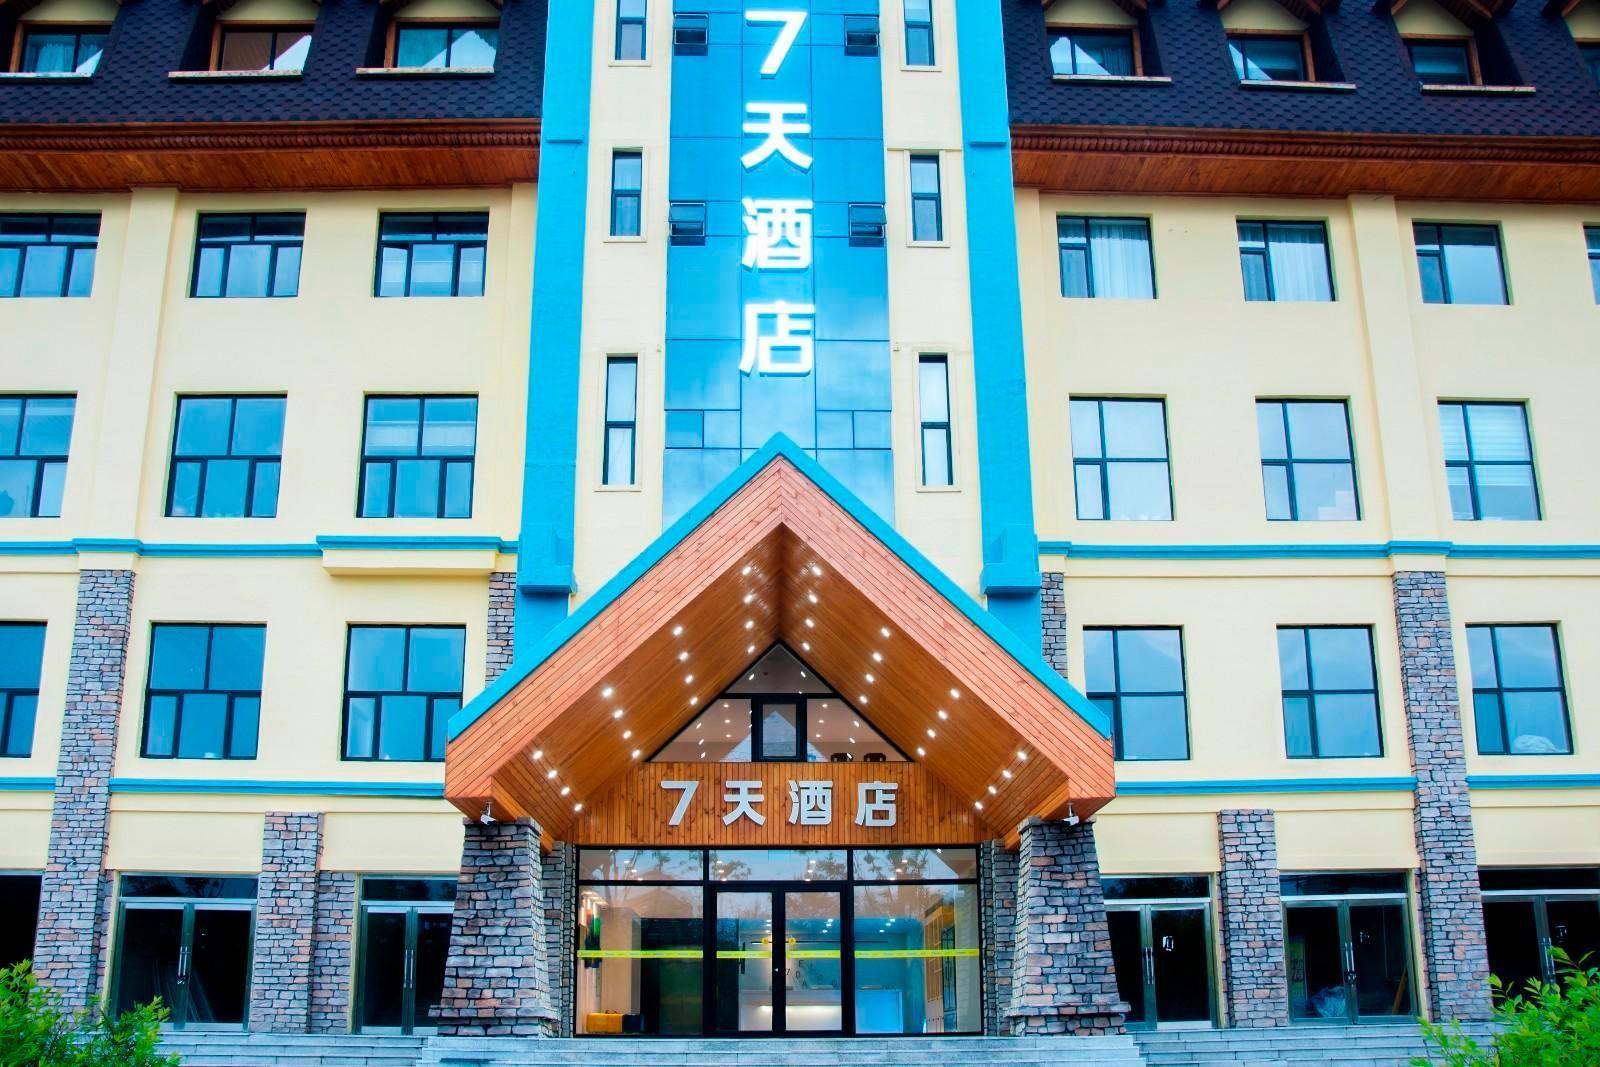 7 Days Inn·Changbai Mountain Beipo, Yanbian Korean